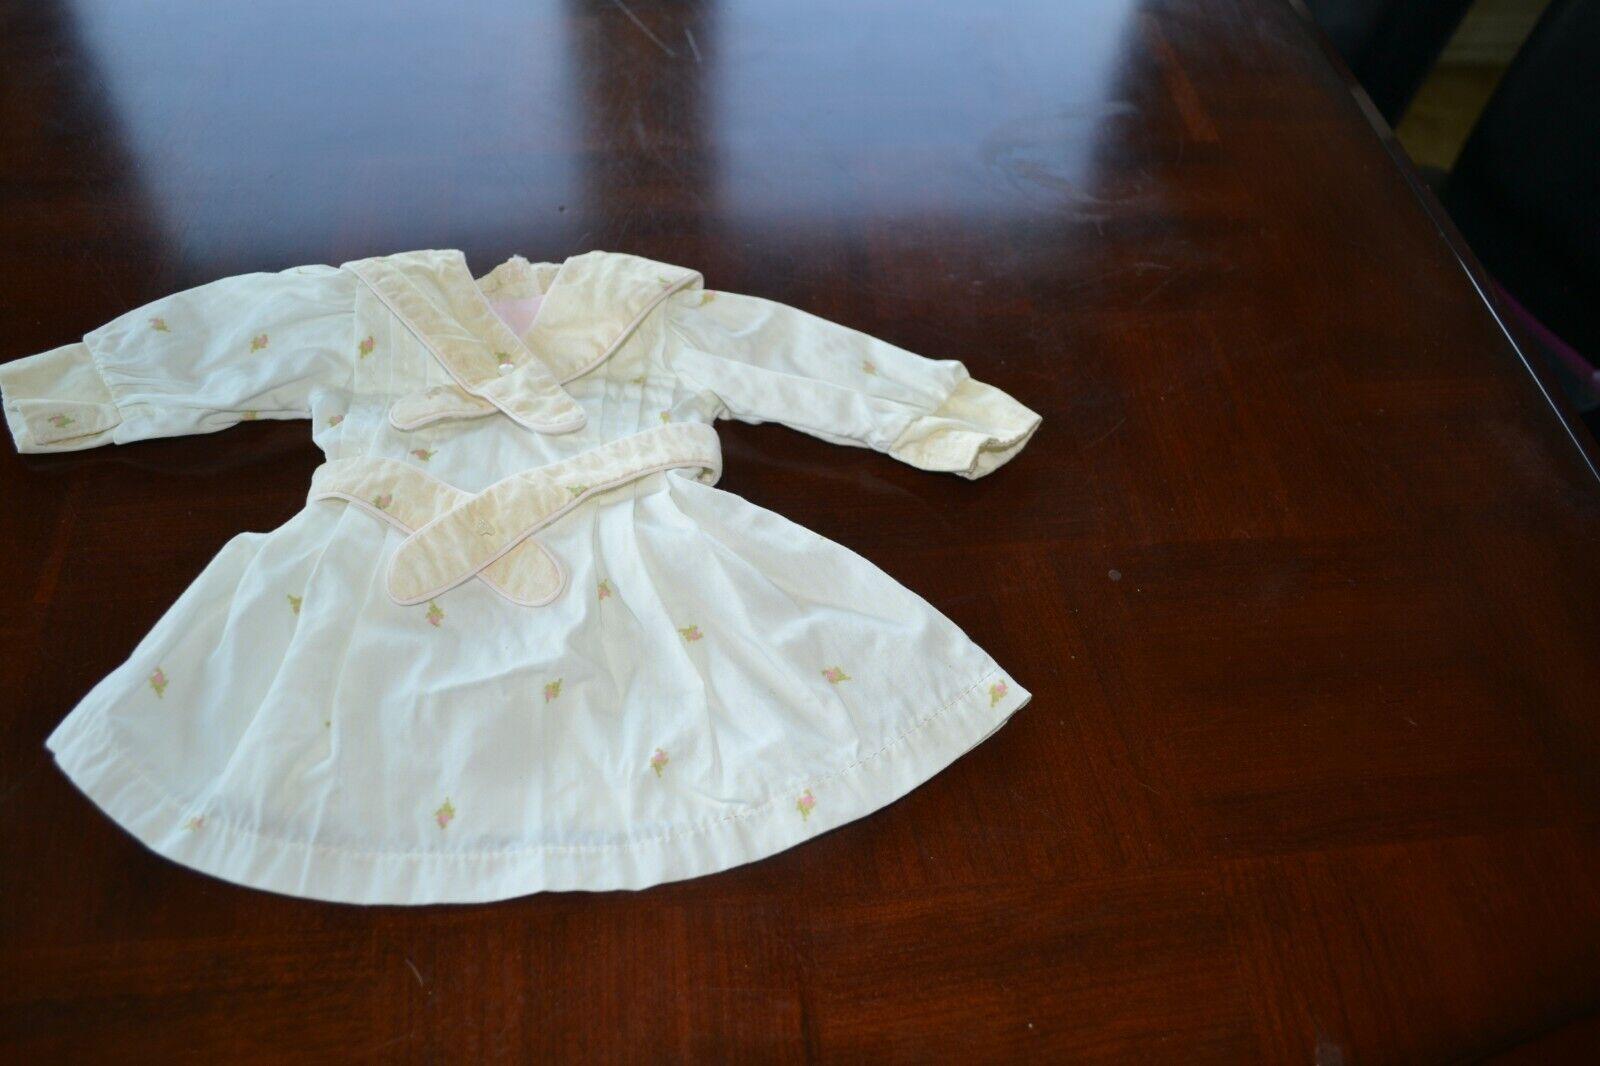 American Girl Samantha's Spring Dress